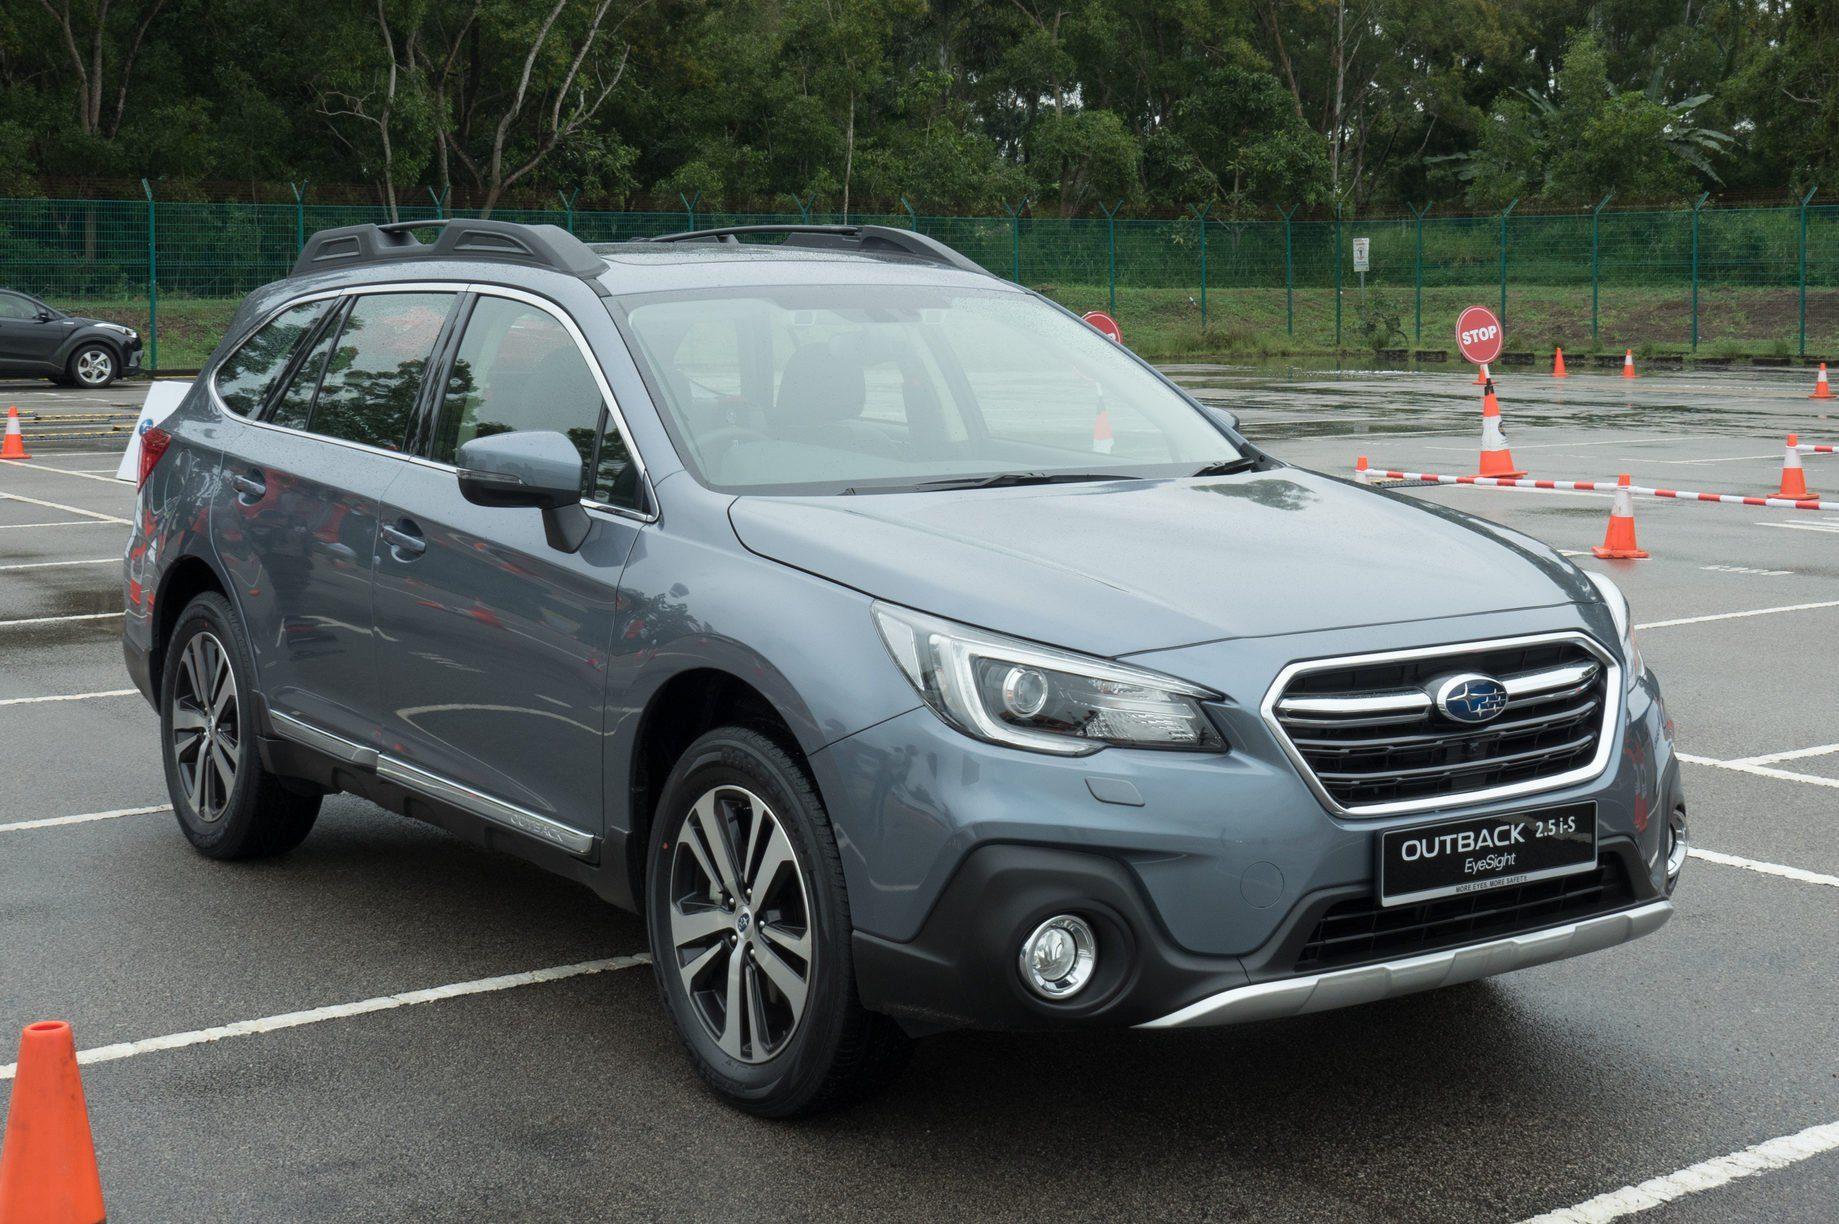 Subaru Outback 2018 Test Drive Day